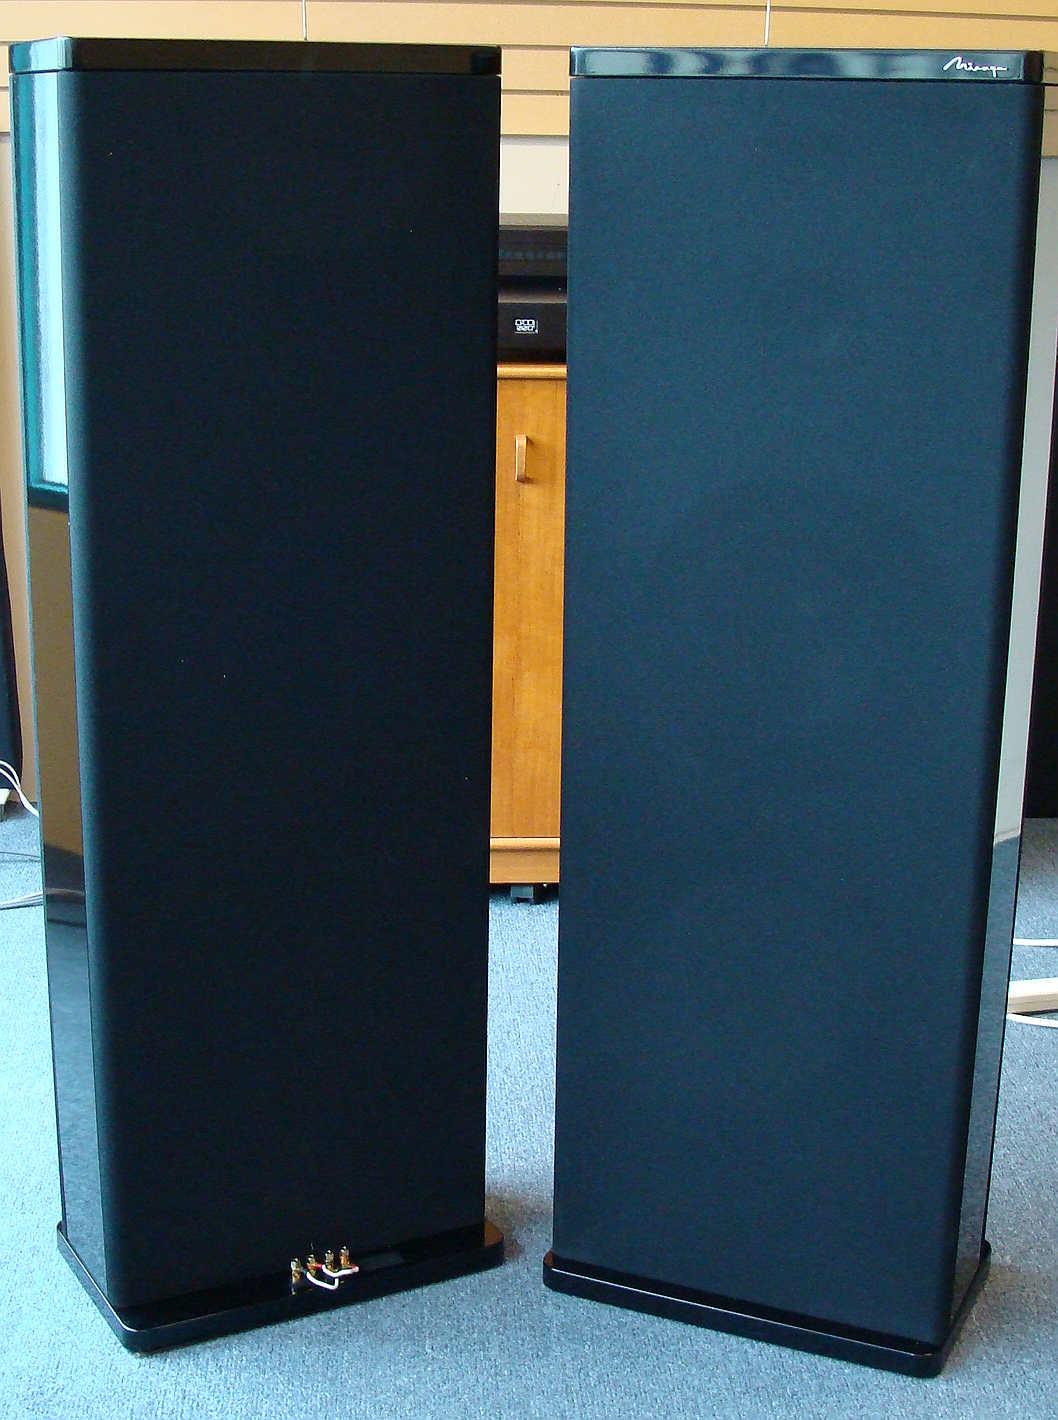 Innovative Audio Mirage M-3si speakers – Innovative Audio